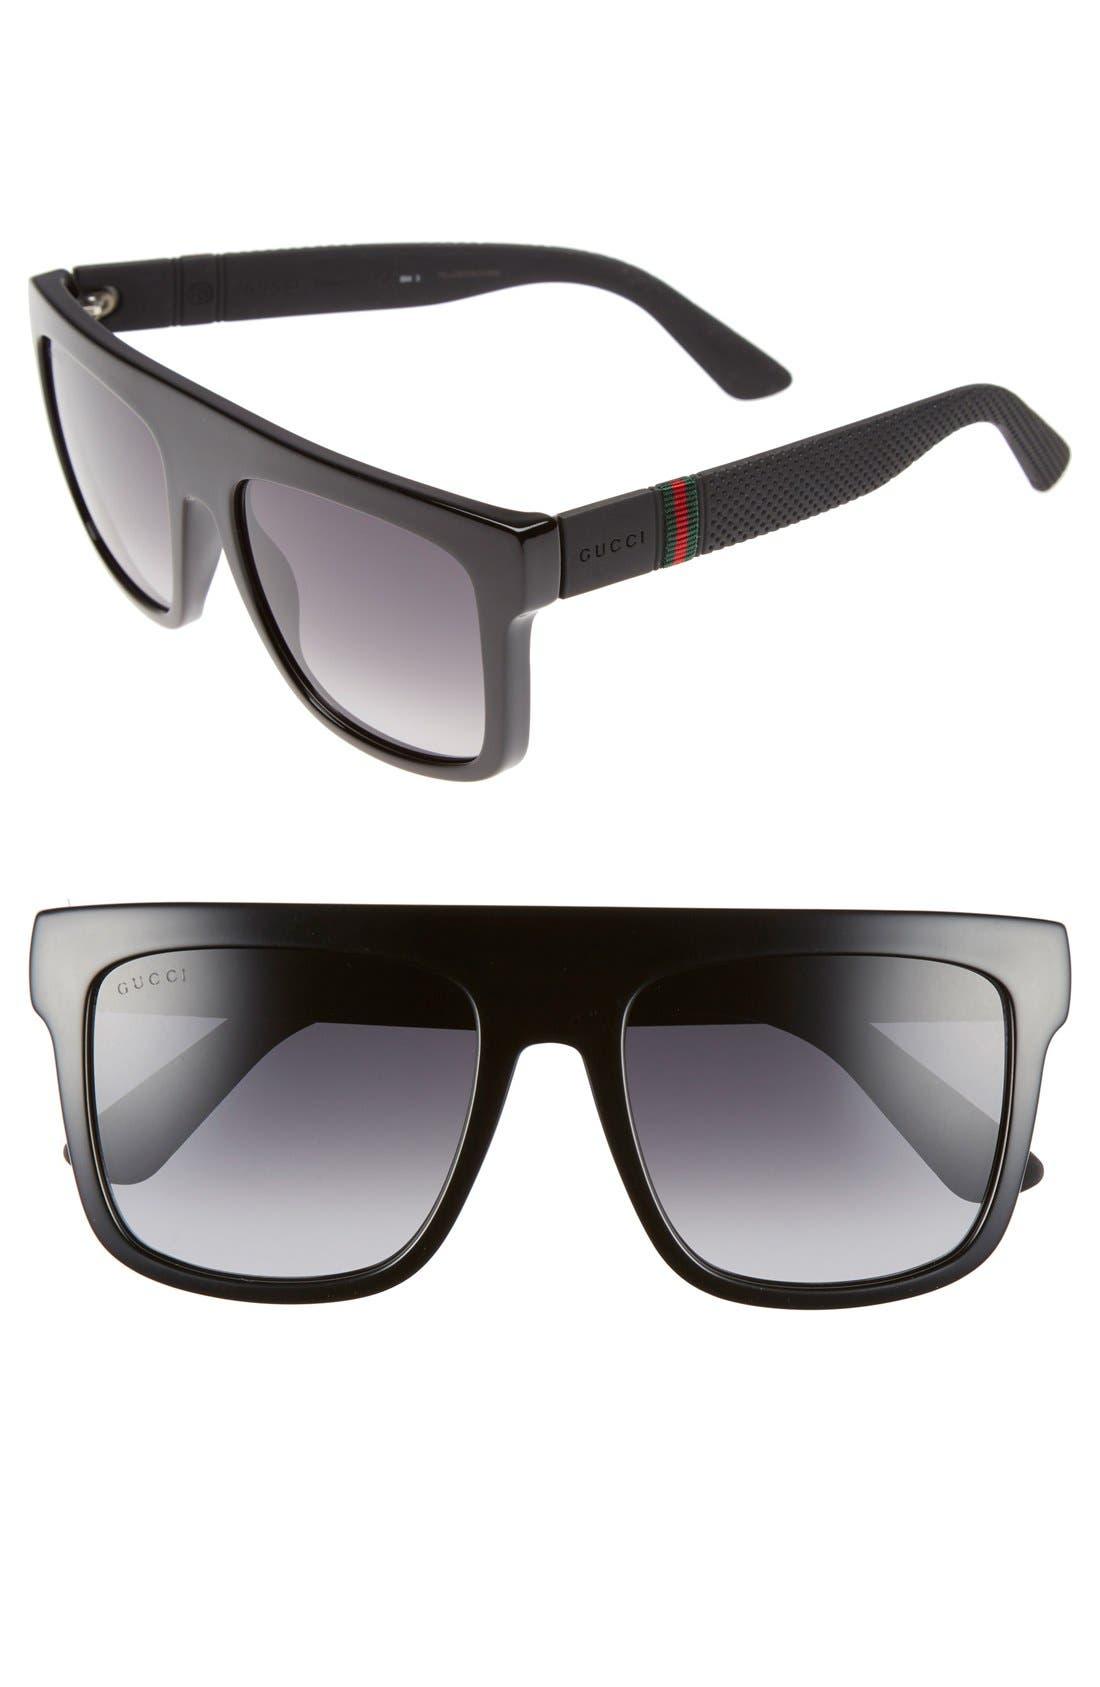 55mm Sunglasses,                             Main thumbnail 1, color,                             001